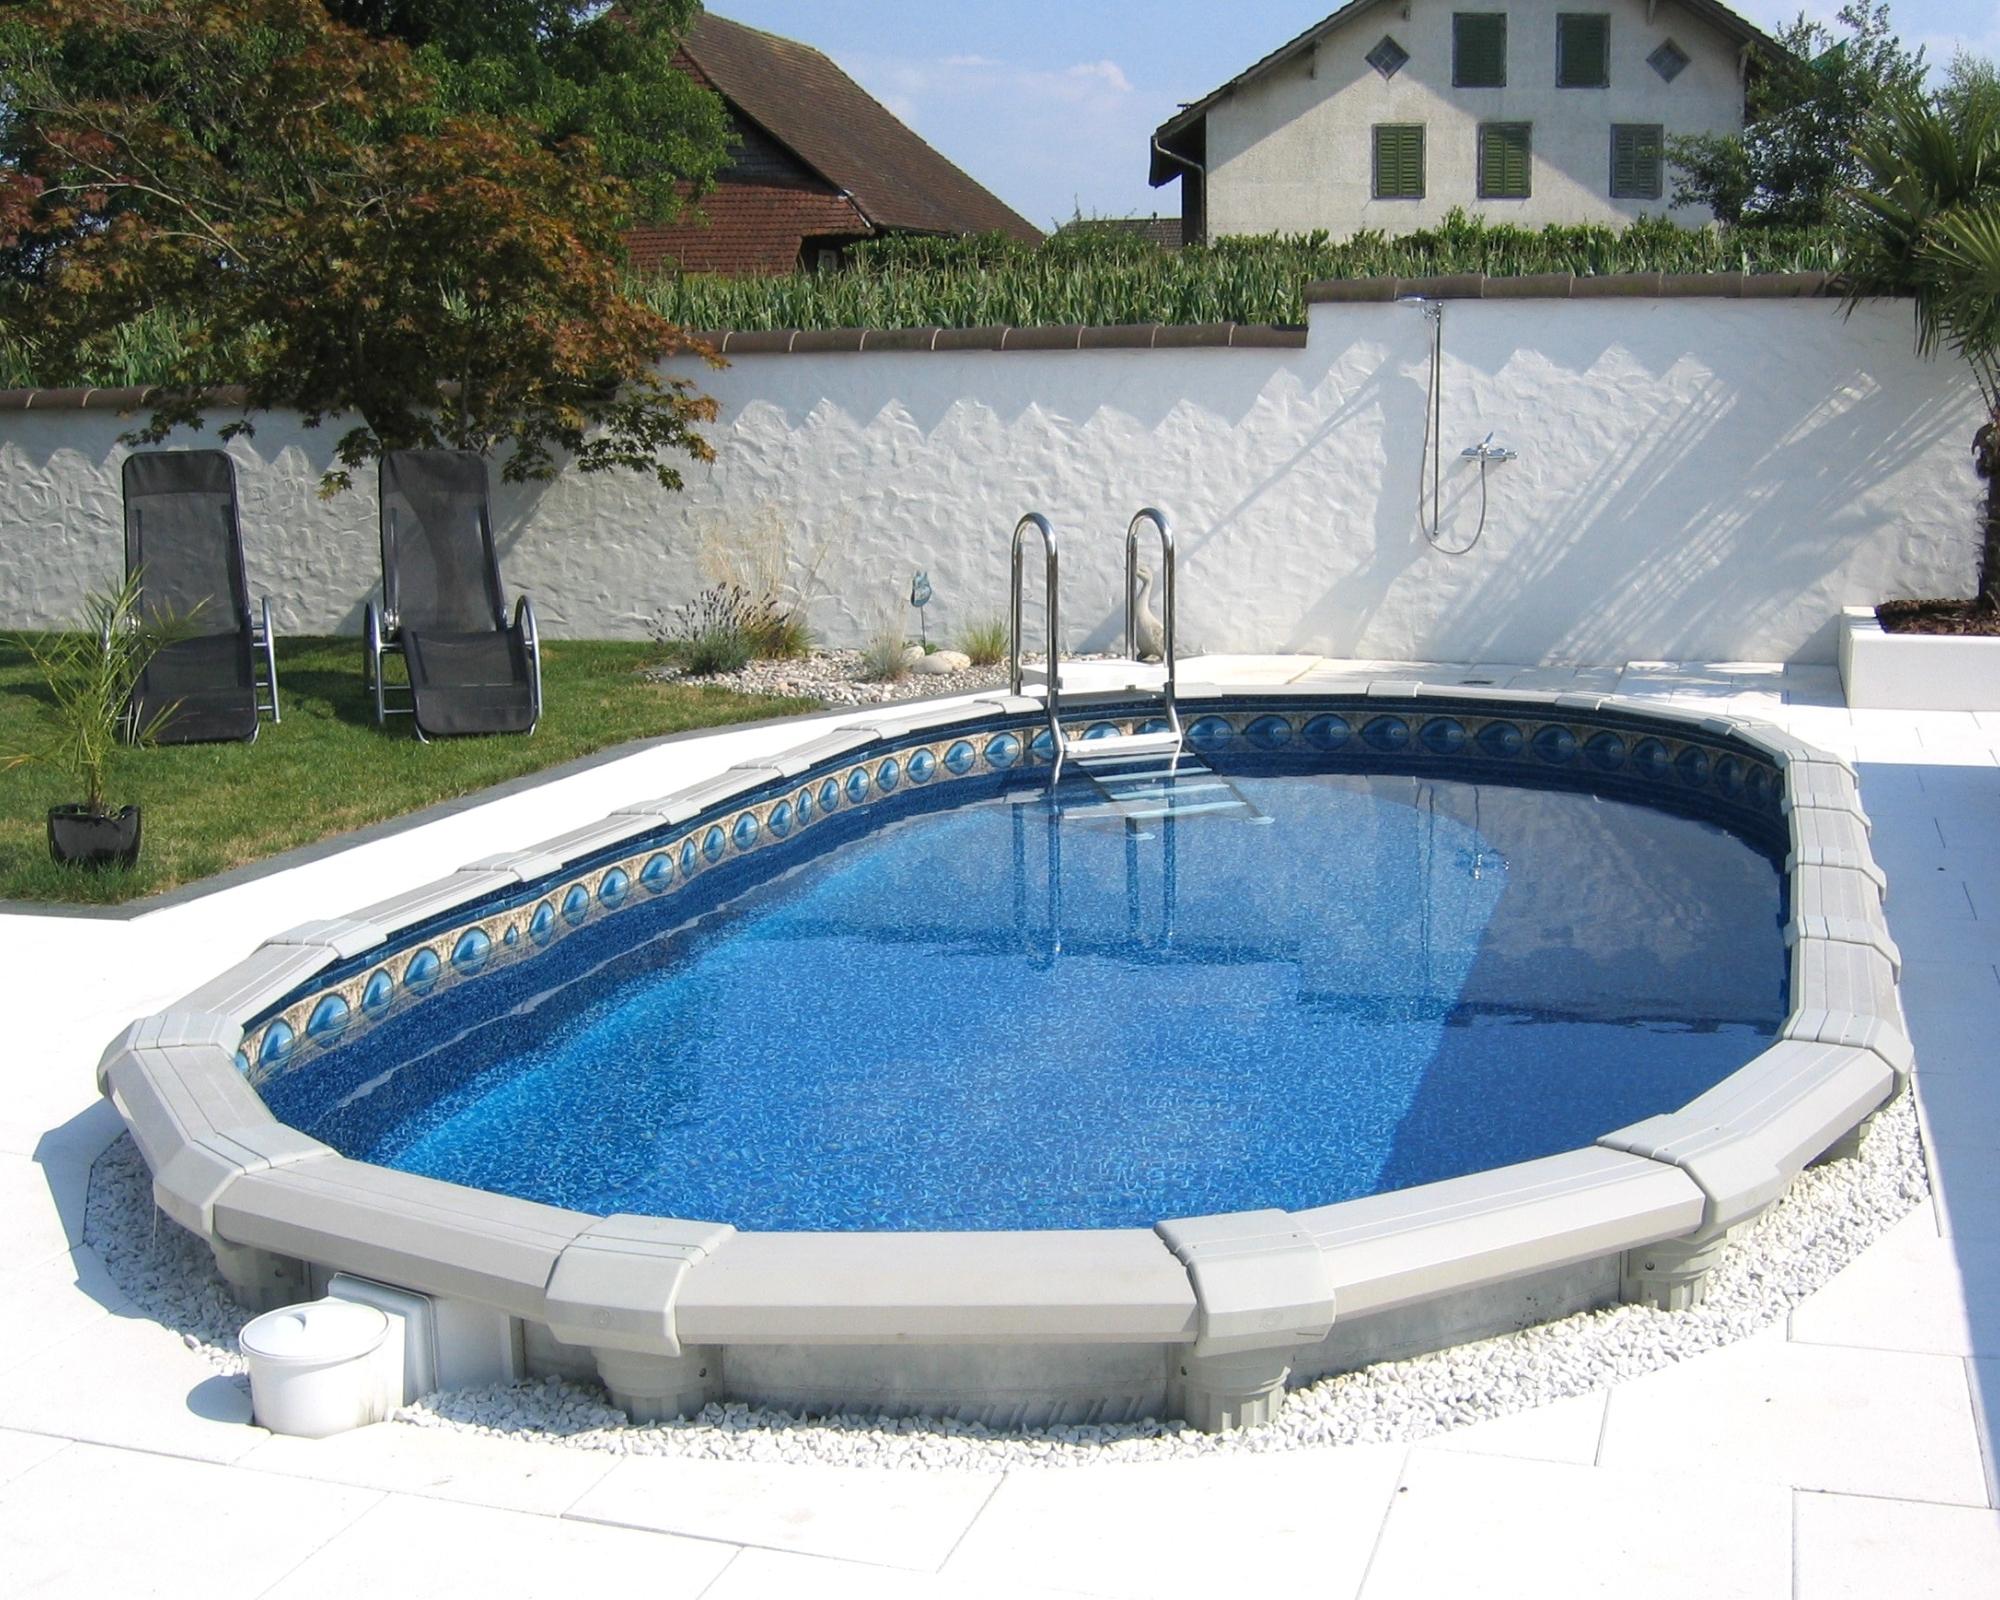 Starkes Stahlwand Pool: Grösse oval 6.60 x 3.25 m - H ...